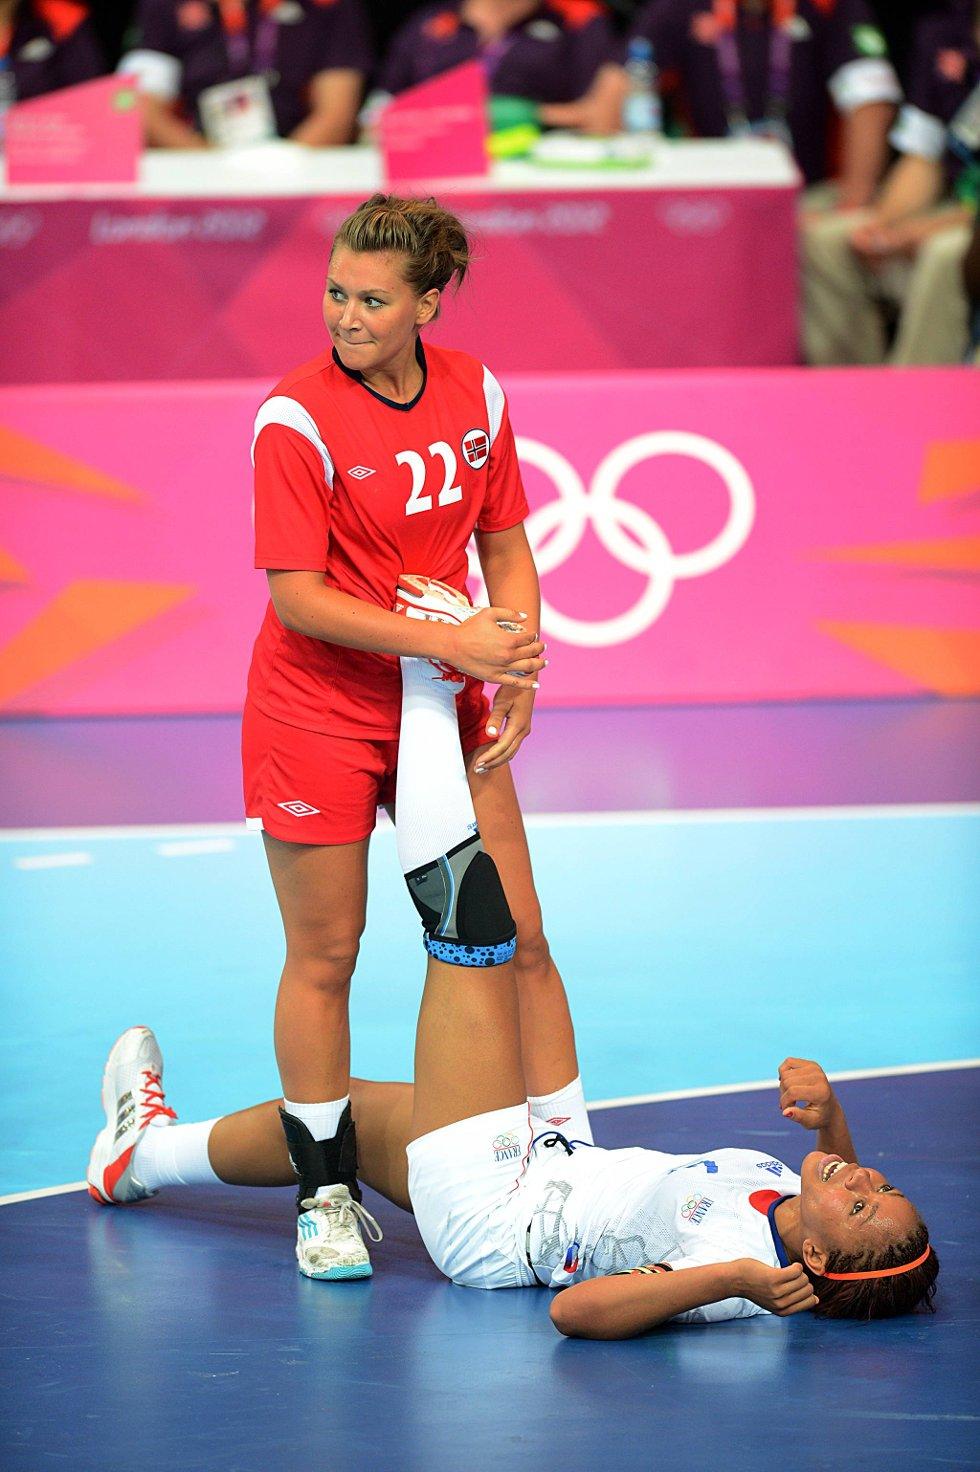 Amanda Kurtovic med fair play når hun tøyer ut en fransk motspiller som vrir seg i krampe. (Foto: Vidar Ruud, ANB)